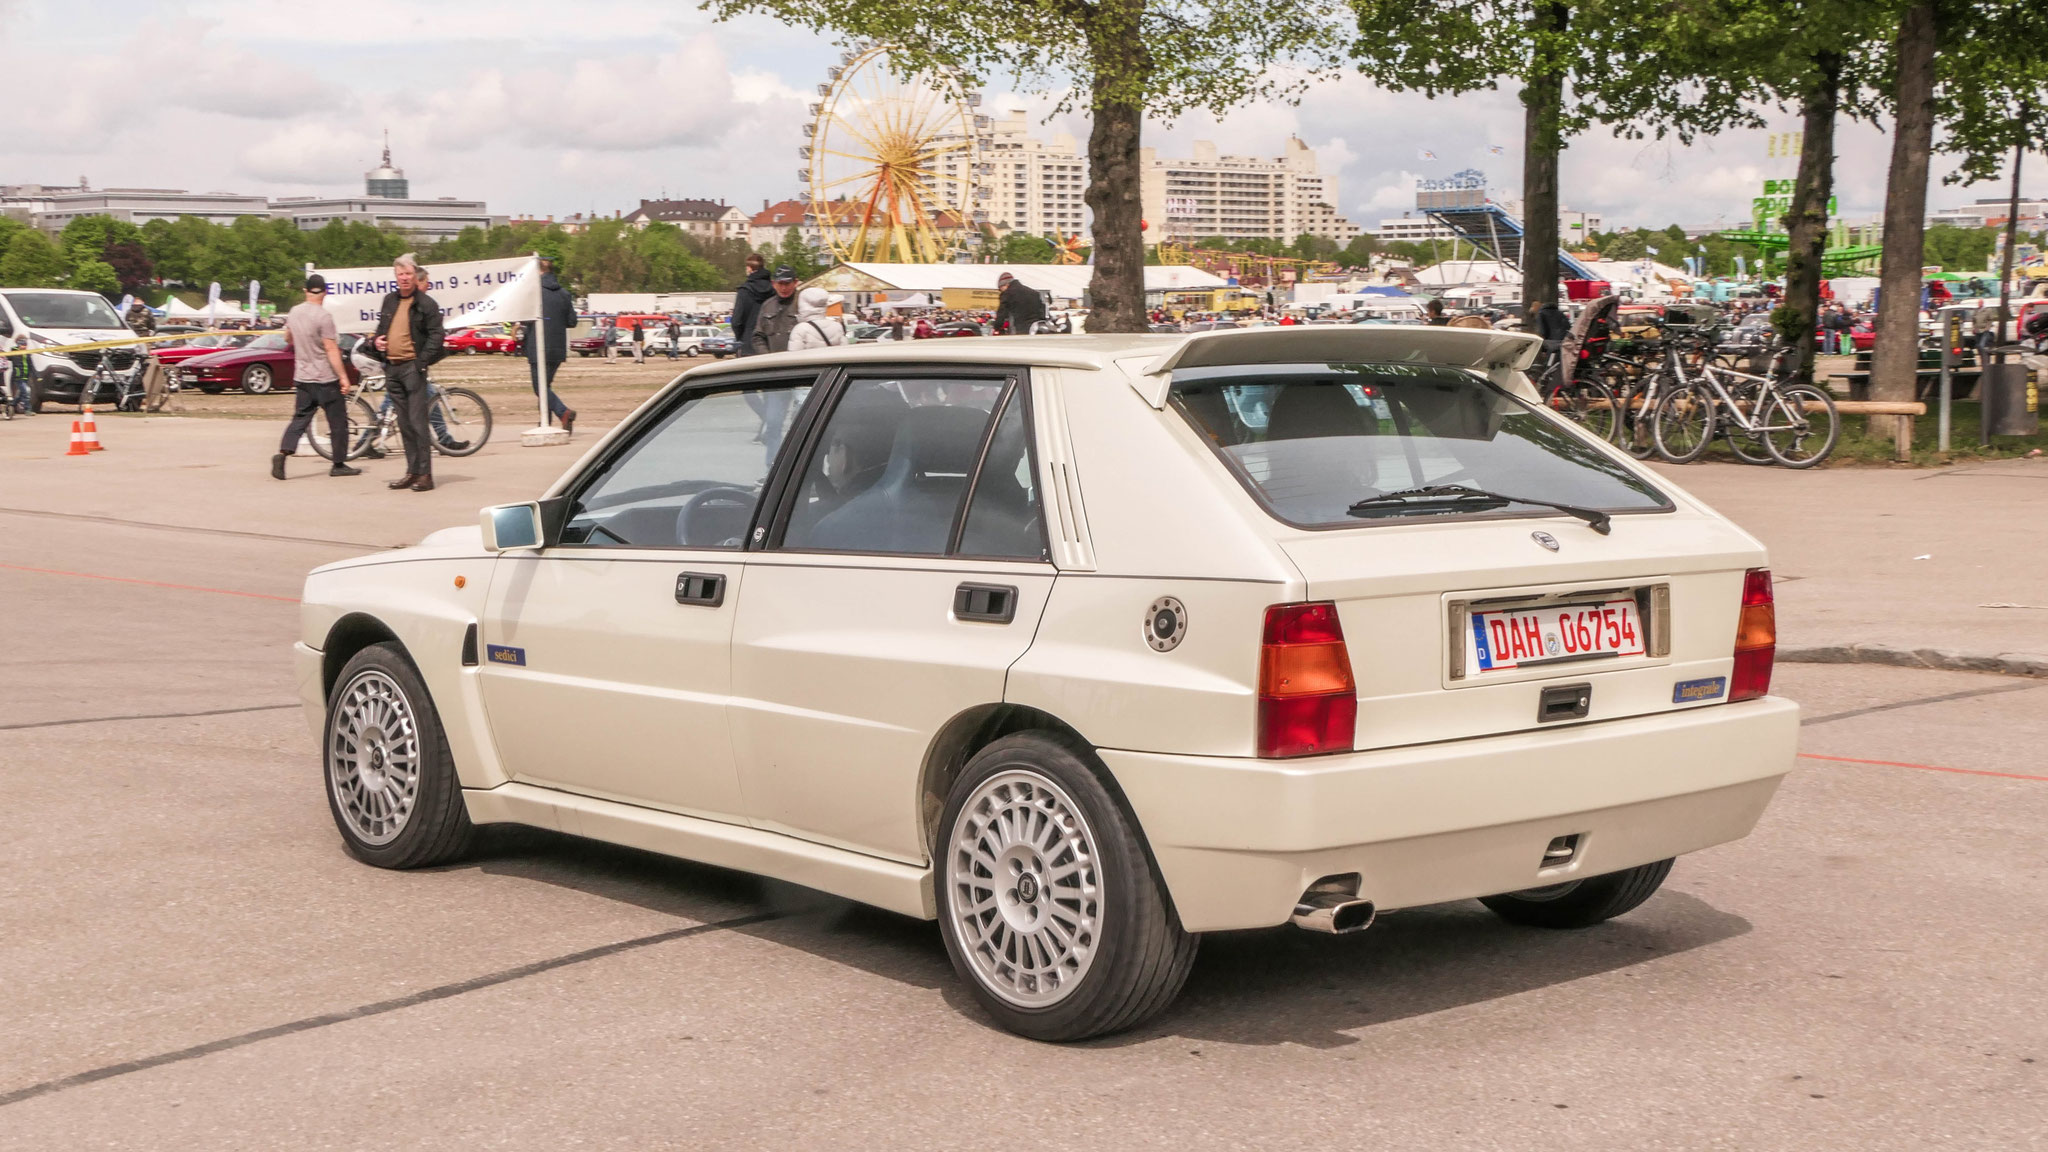 Lancia Delta Integrale - DAH-06754